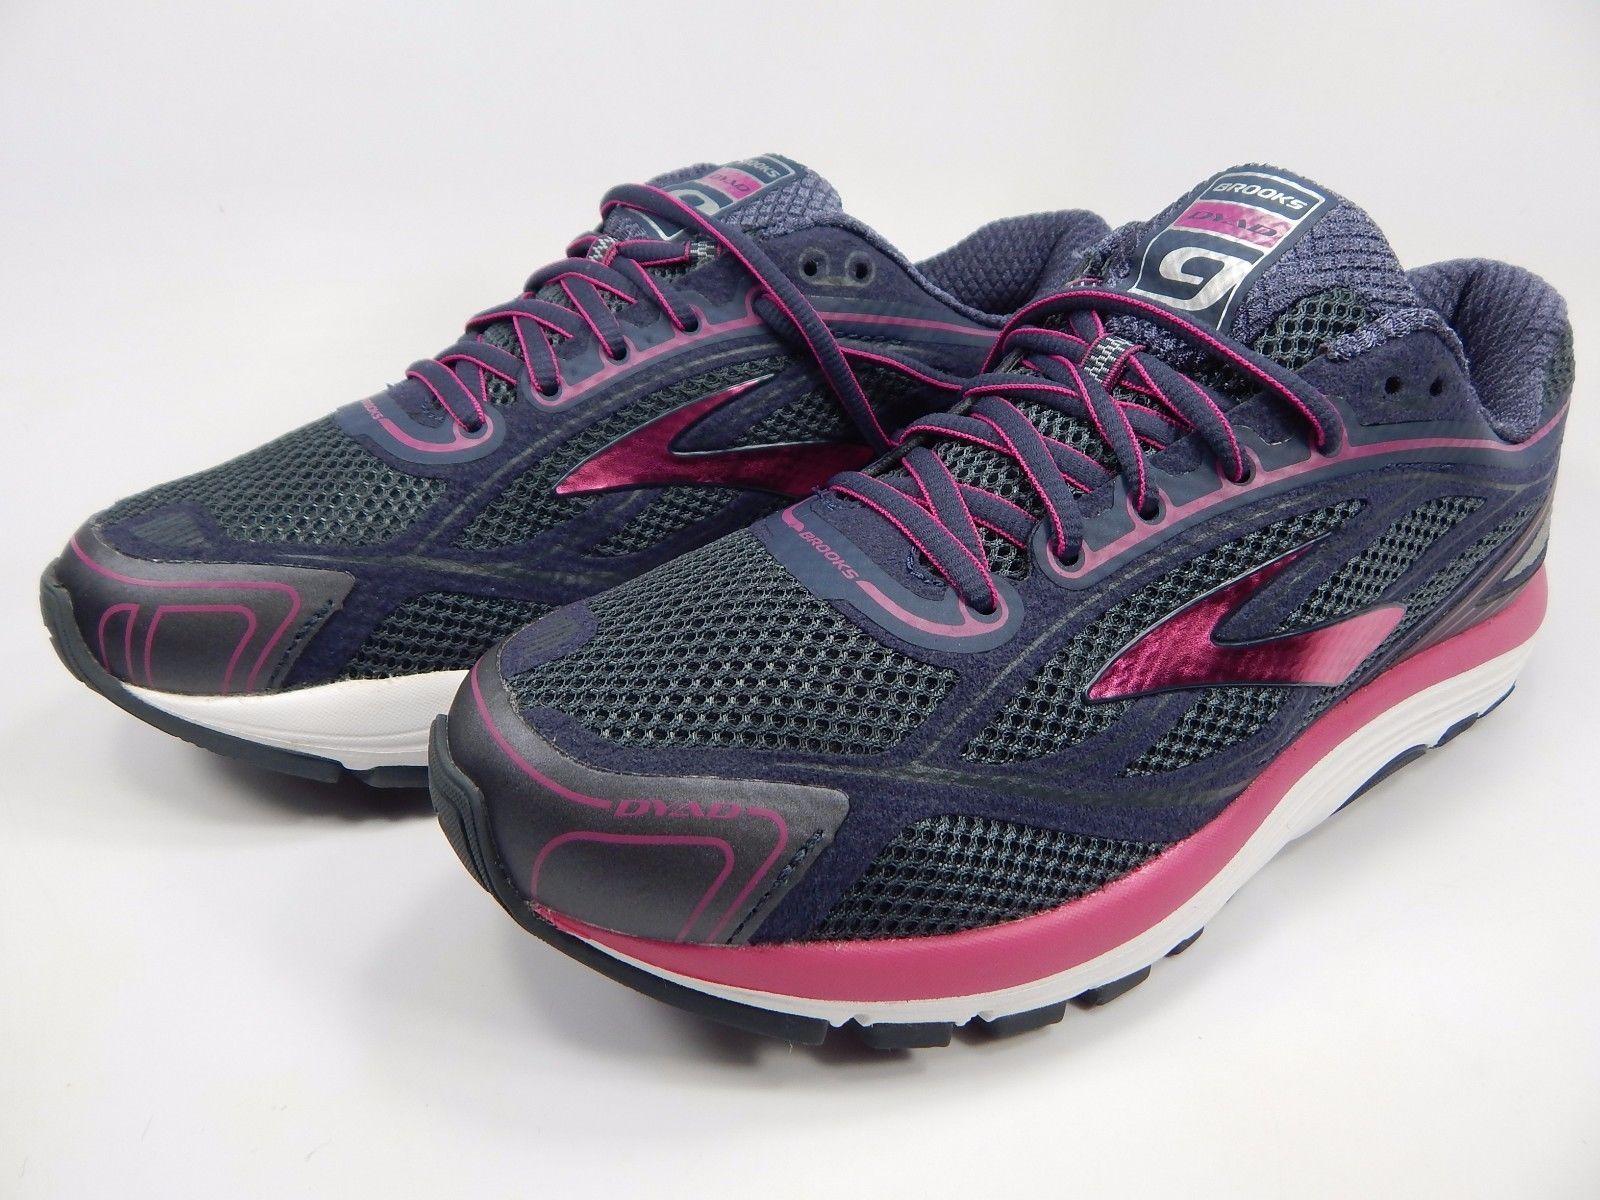 Brooks Dyad 9 Women's Running Shoes Size US 9 M (B) EU 40.5 1202231B442 Blue